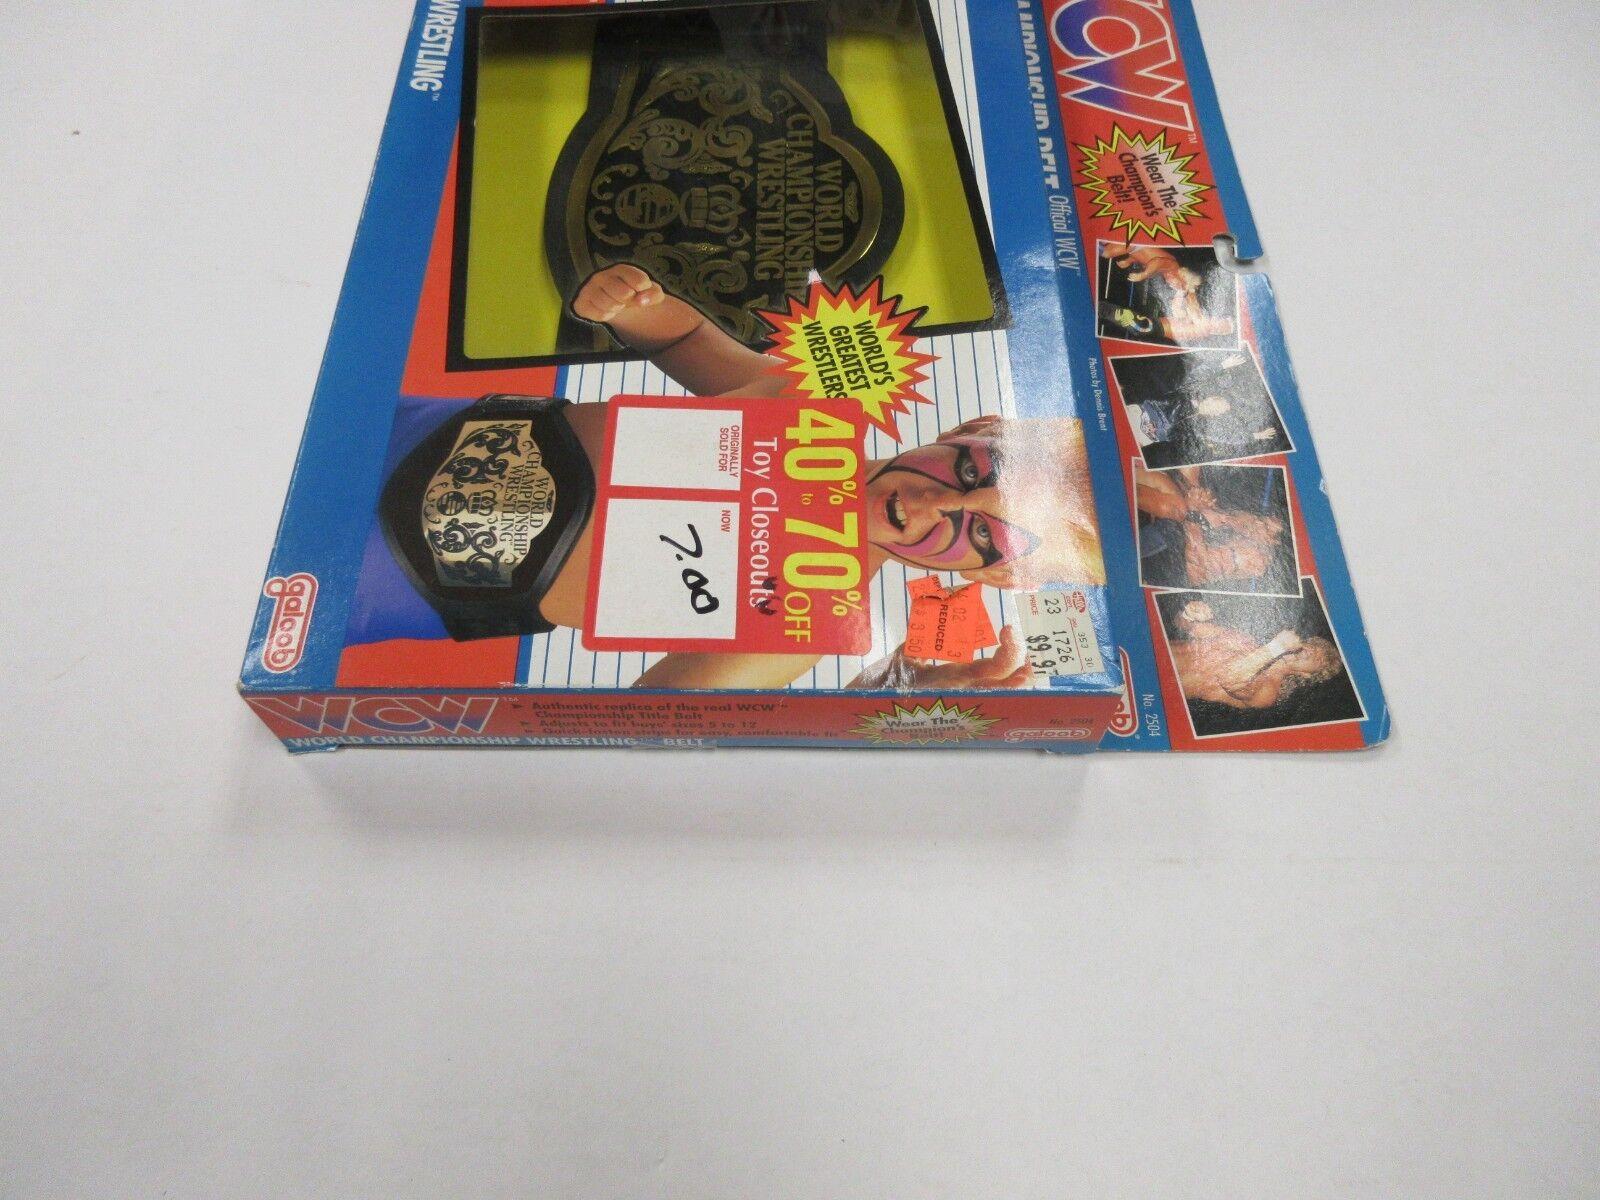 1991 GALOOB GALOOB GALOOB WCW CHAMPIONSHIP BELT FACTORY SEALED 08b4b8